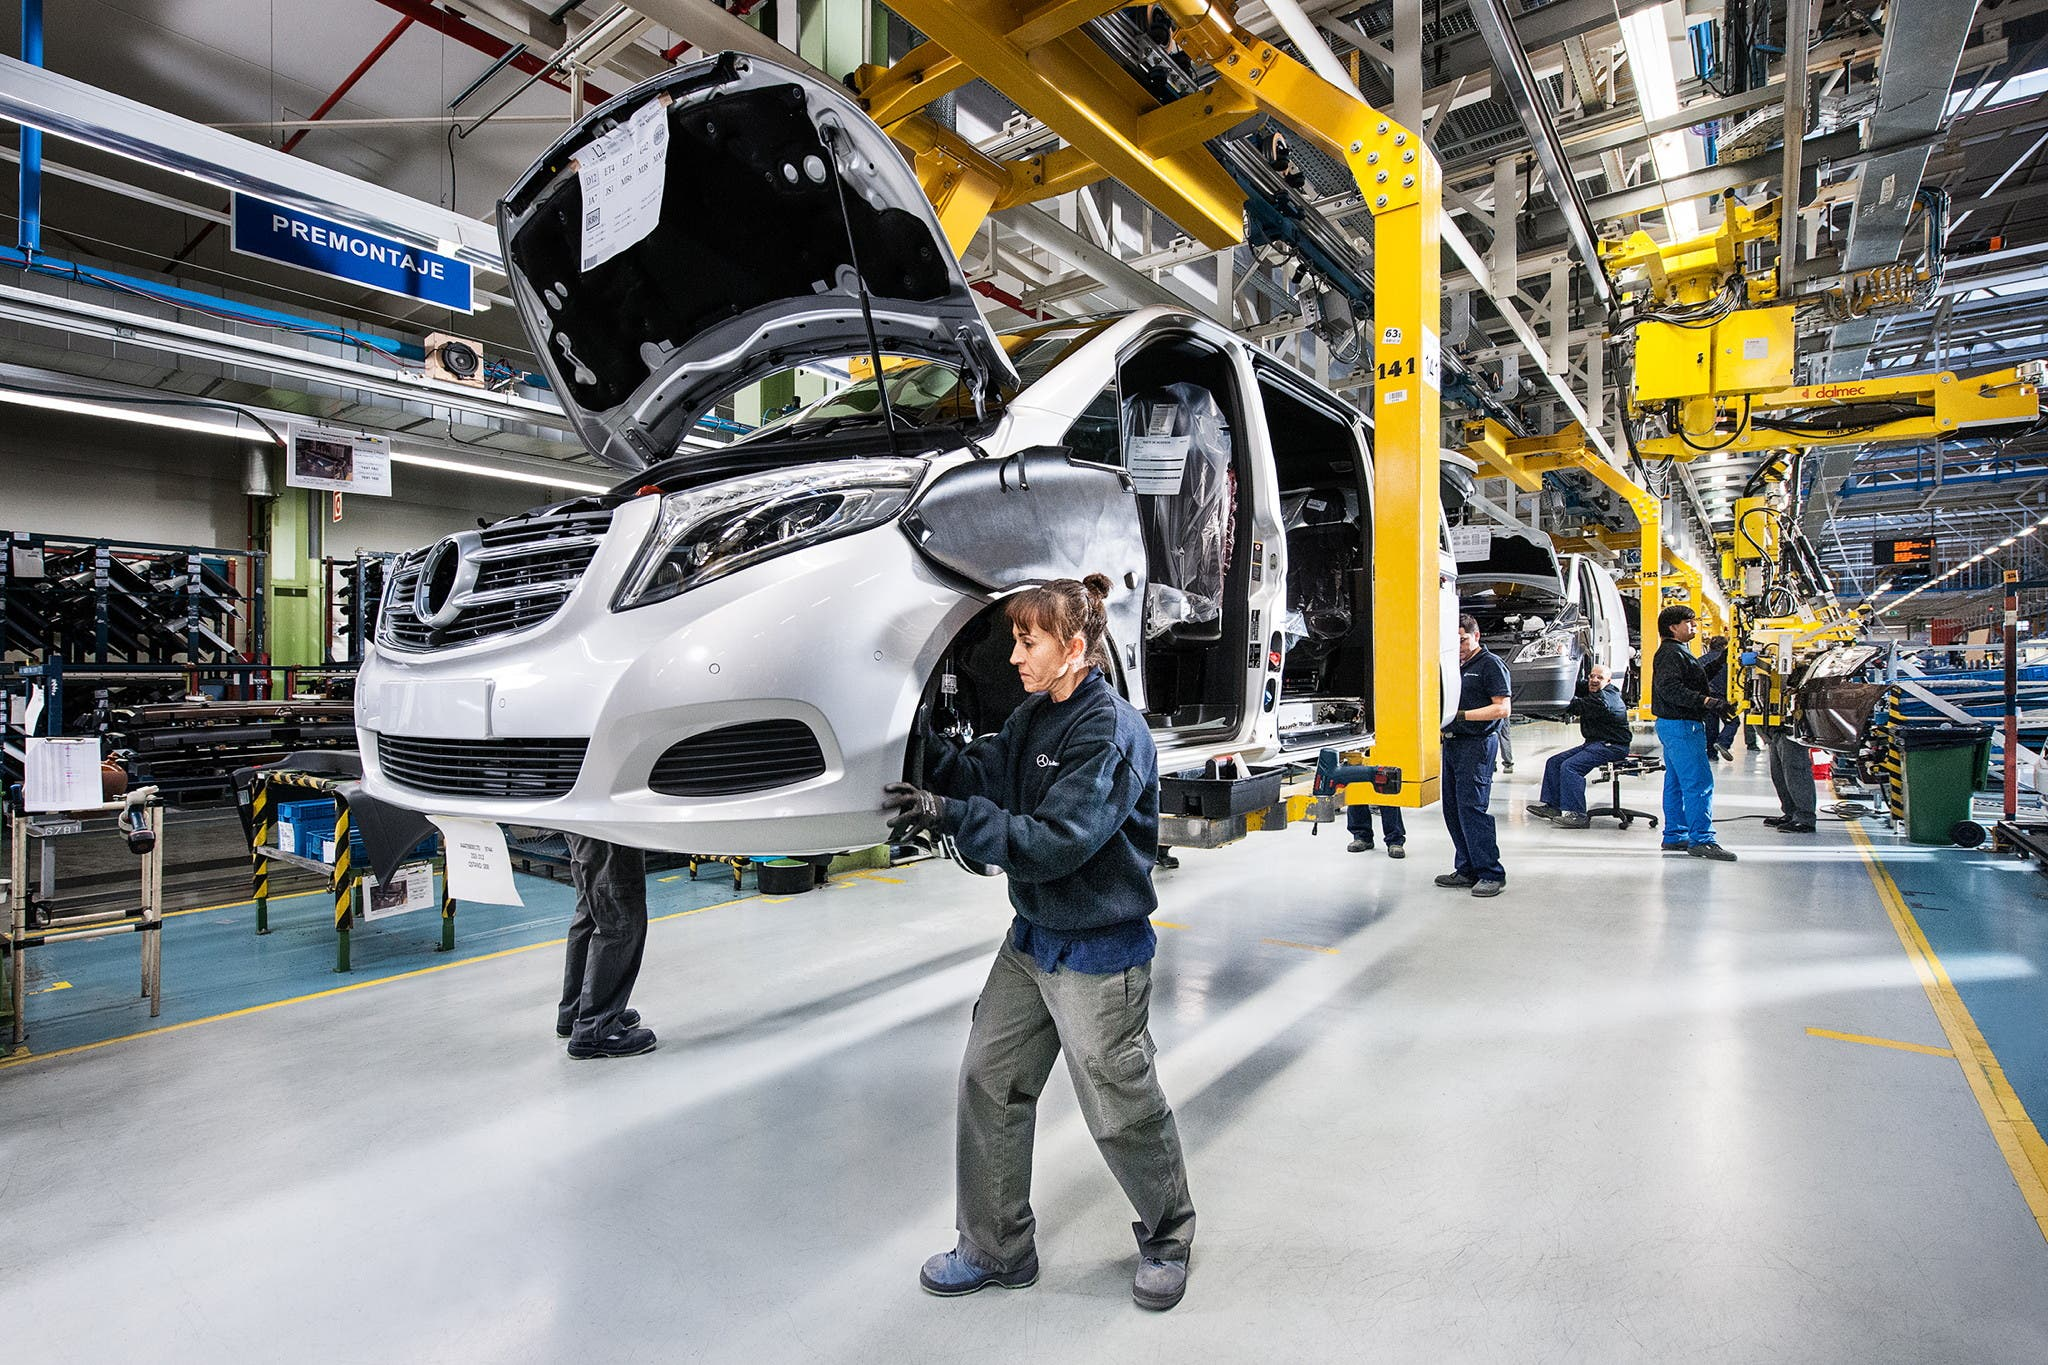 Spain is pulling ahead in worldwide production race